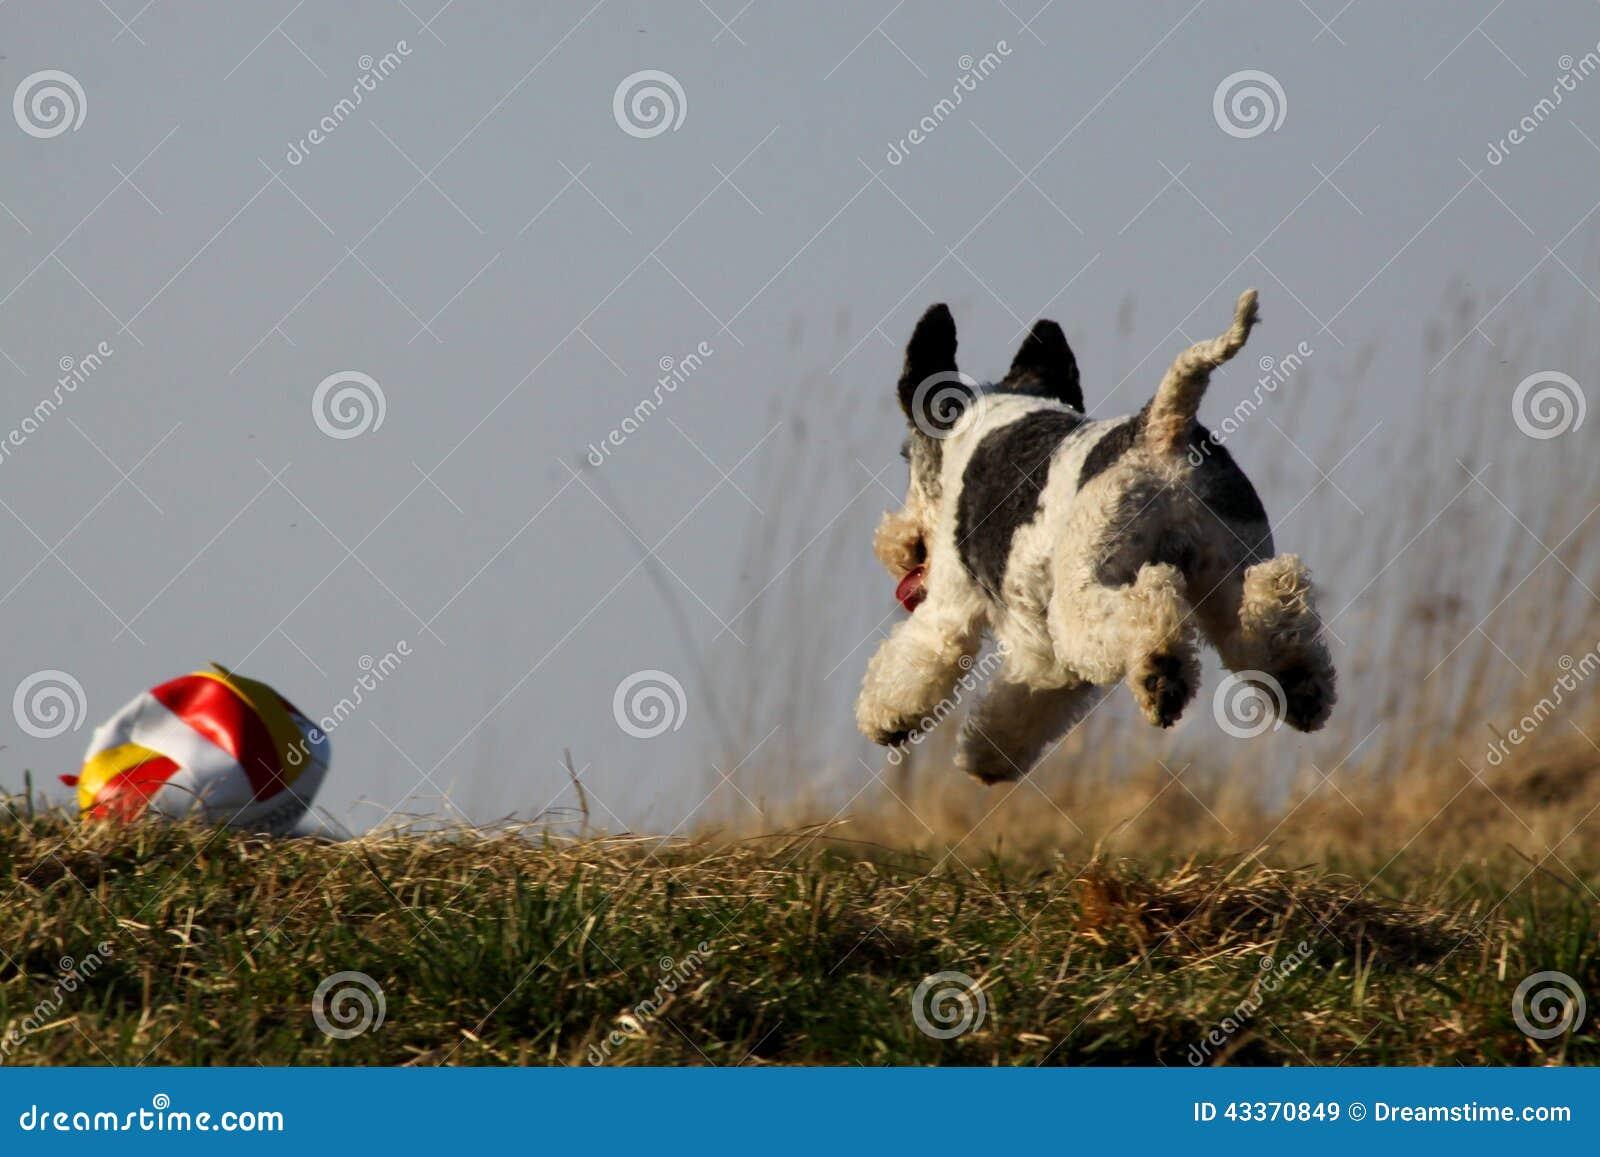 Cute Dog Running Stock Image Image Of Running Ball 43370849